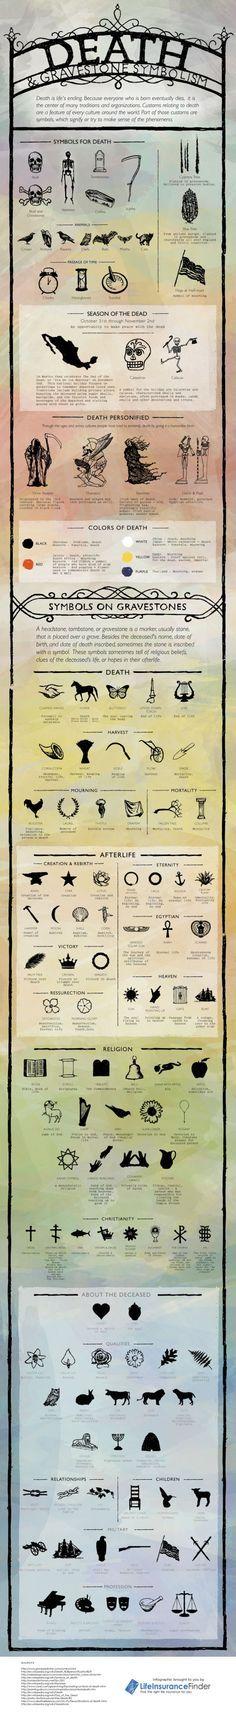 DEATH & GRAVESTONE SYMBOLISM - http://www.coolinfoimages.com/infographics/death-gravestone-symbolism/